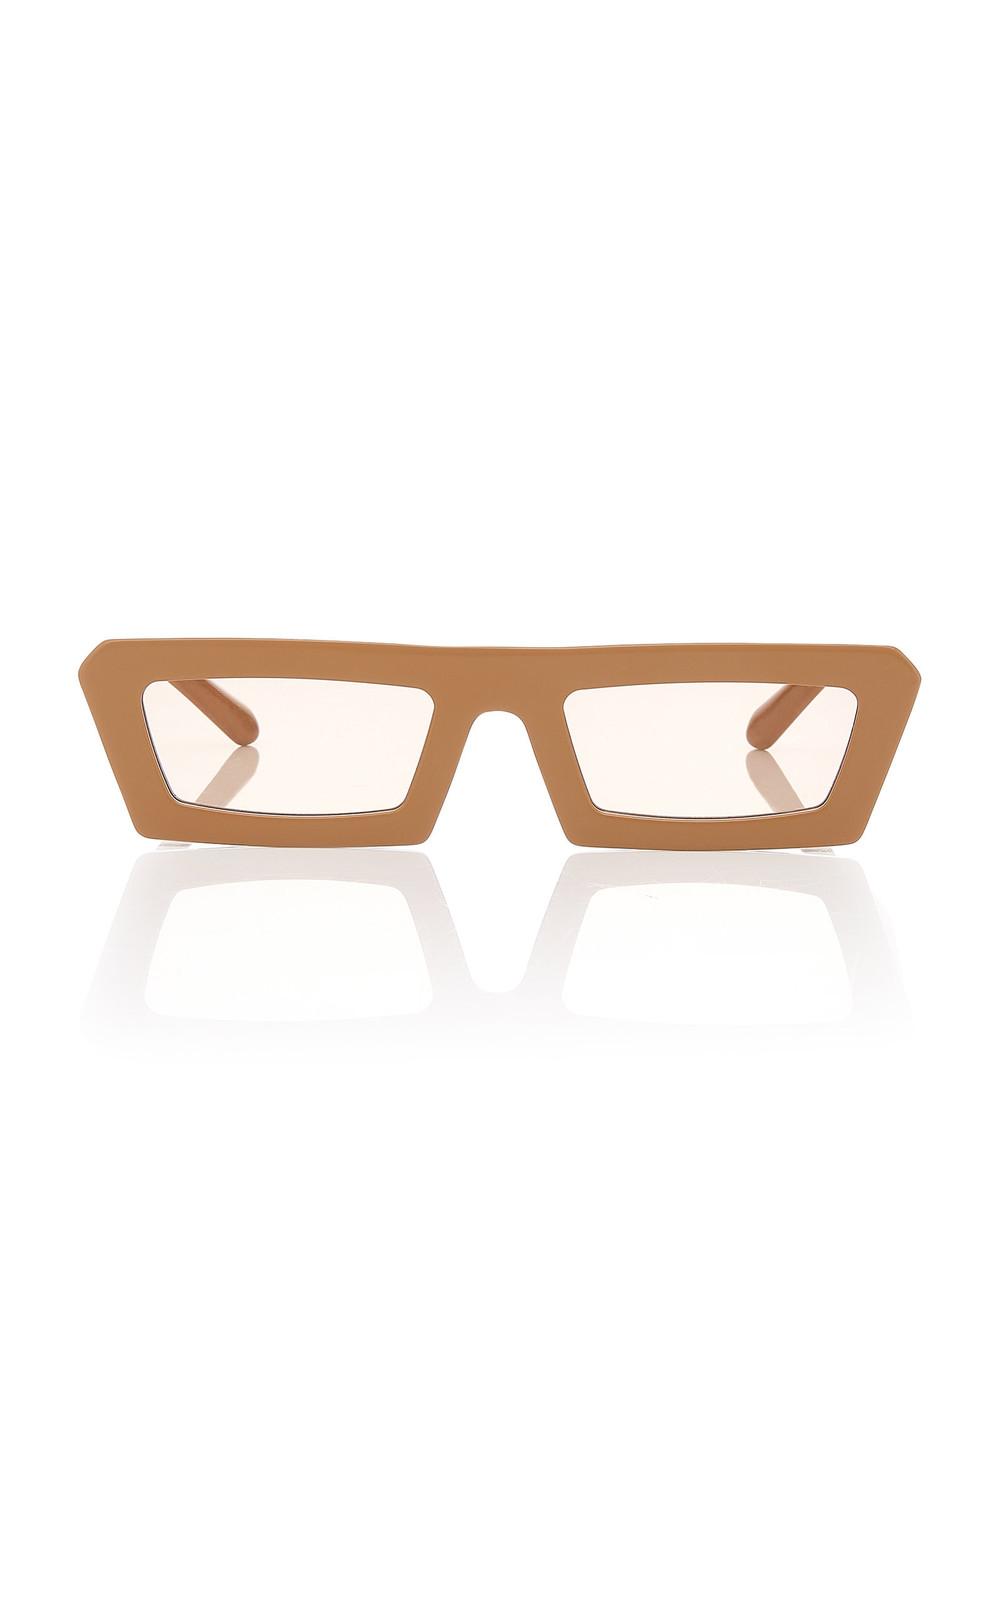 Karen Walker Shipwrecks Rectangle Acetate Sunglasses in neutral